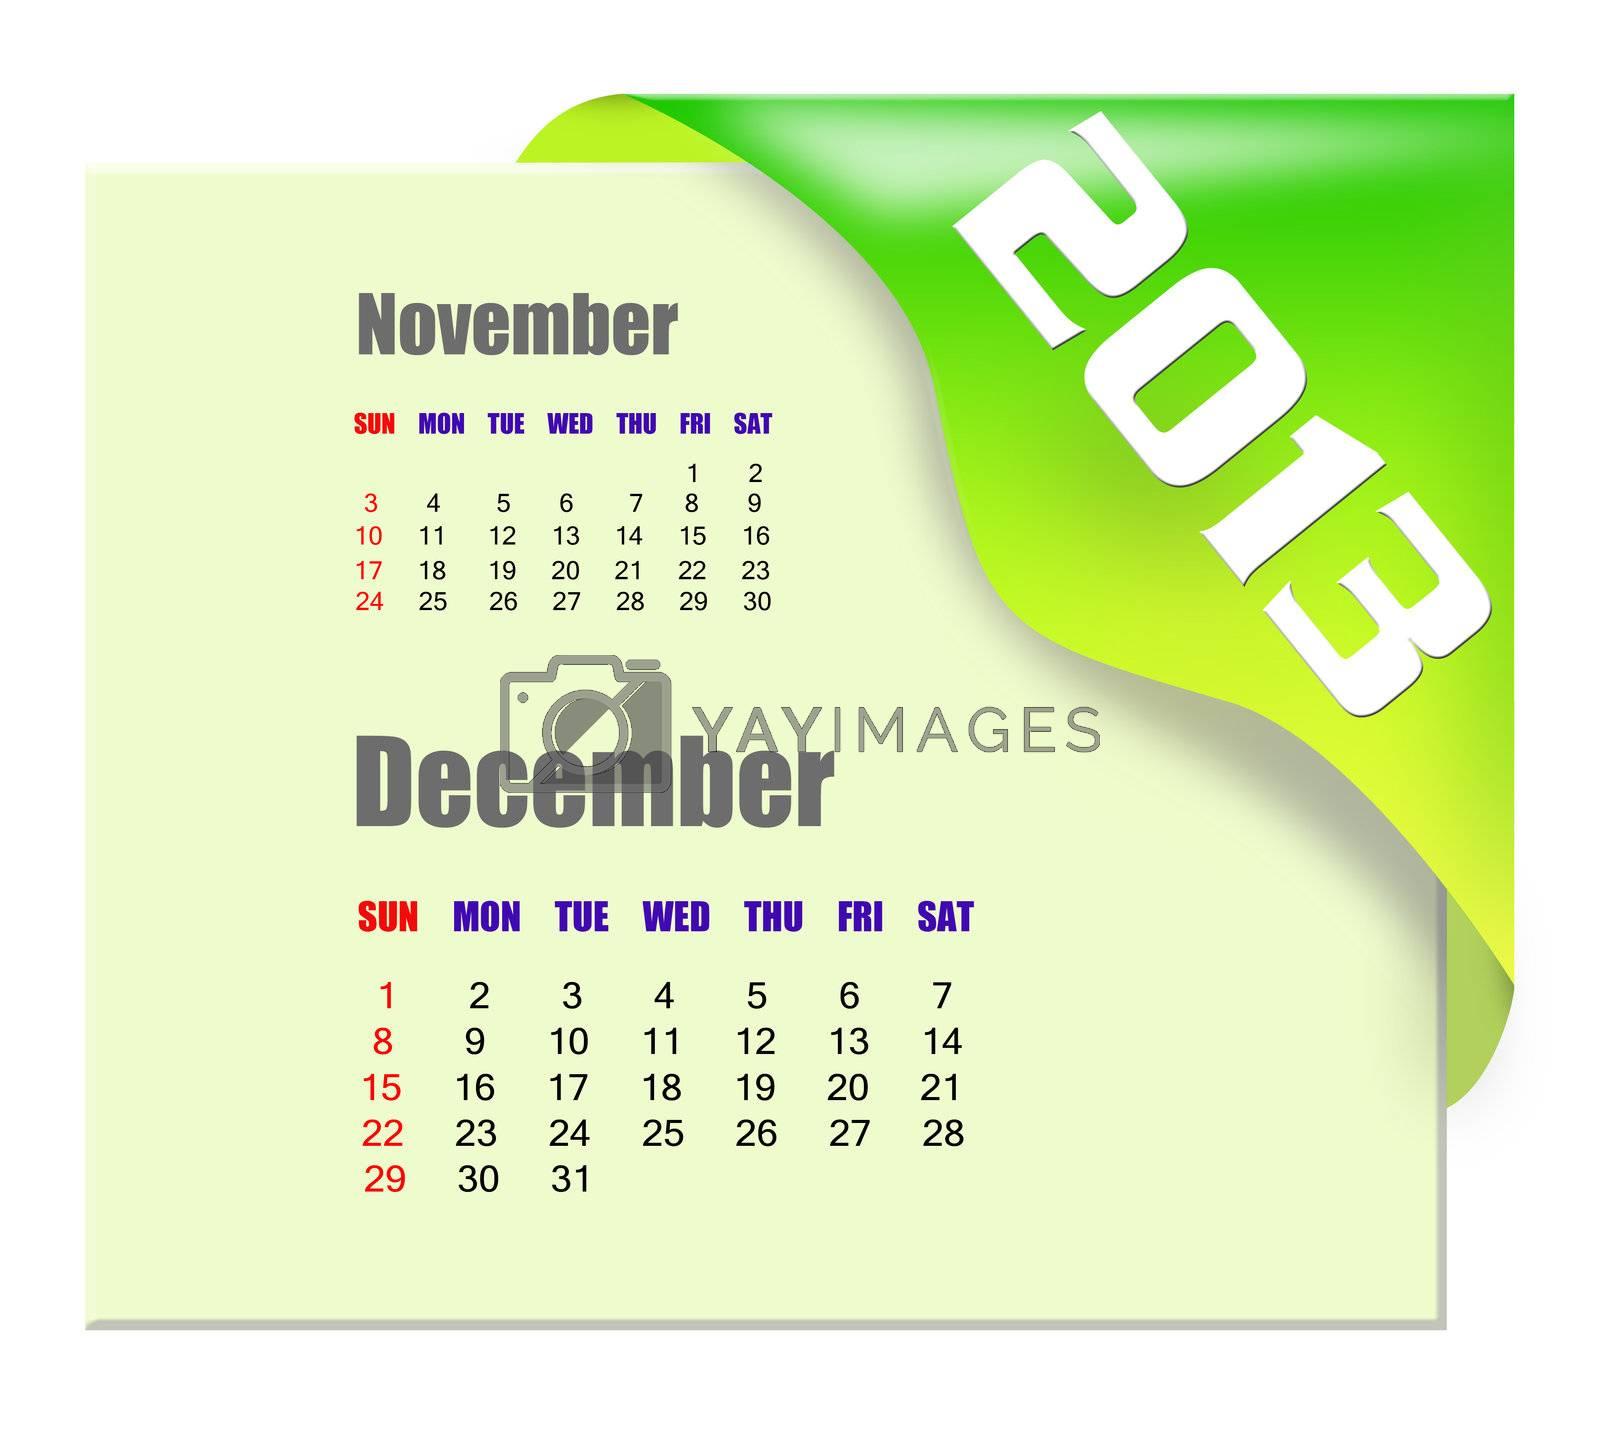 2013 December calendar  by payphoto